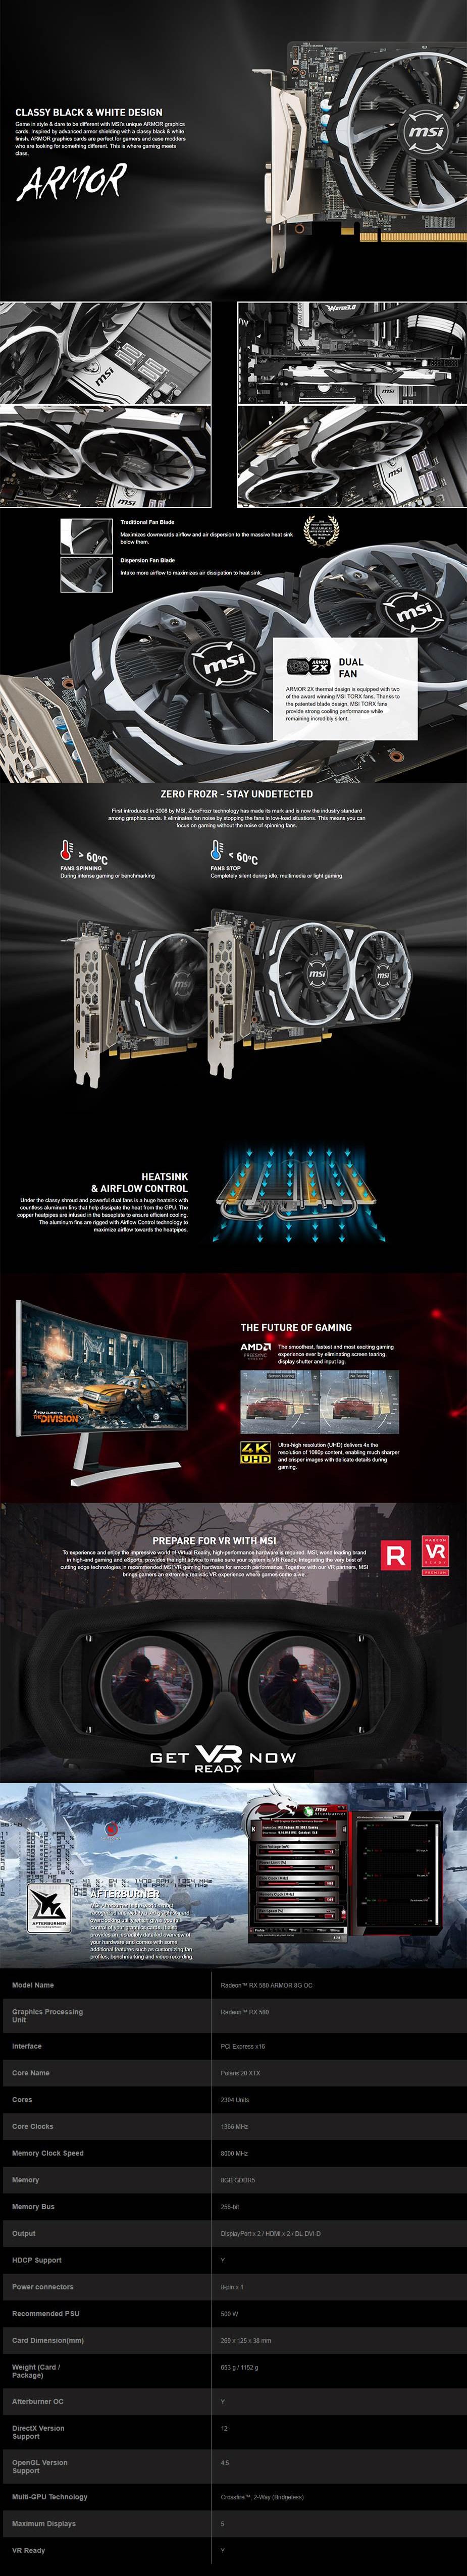 MSI Radeon RX 580 Armor OC 8GB Video Card - Refurbished - Desktop Overview